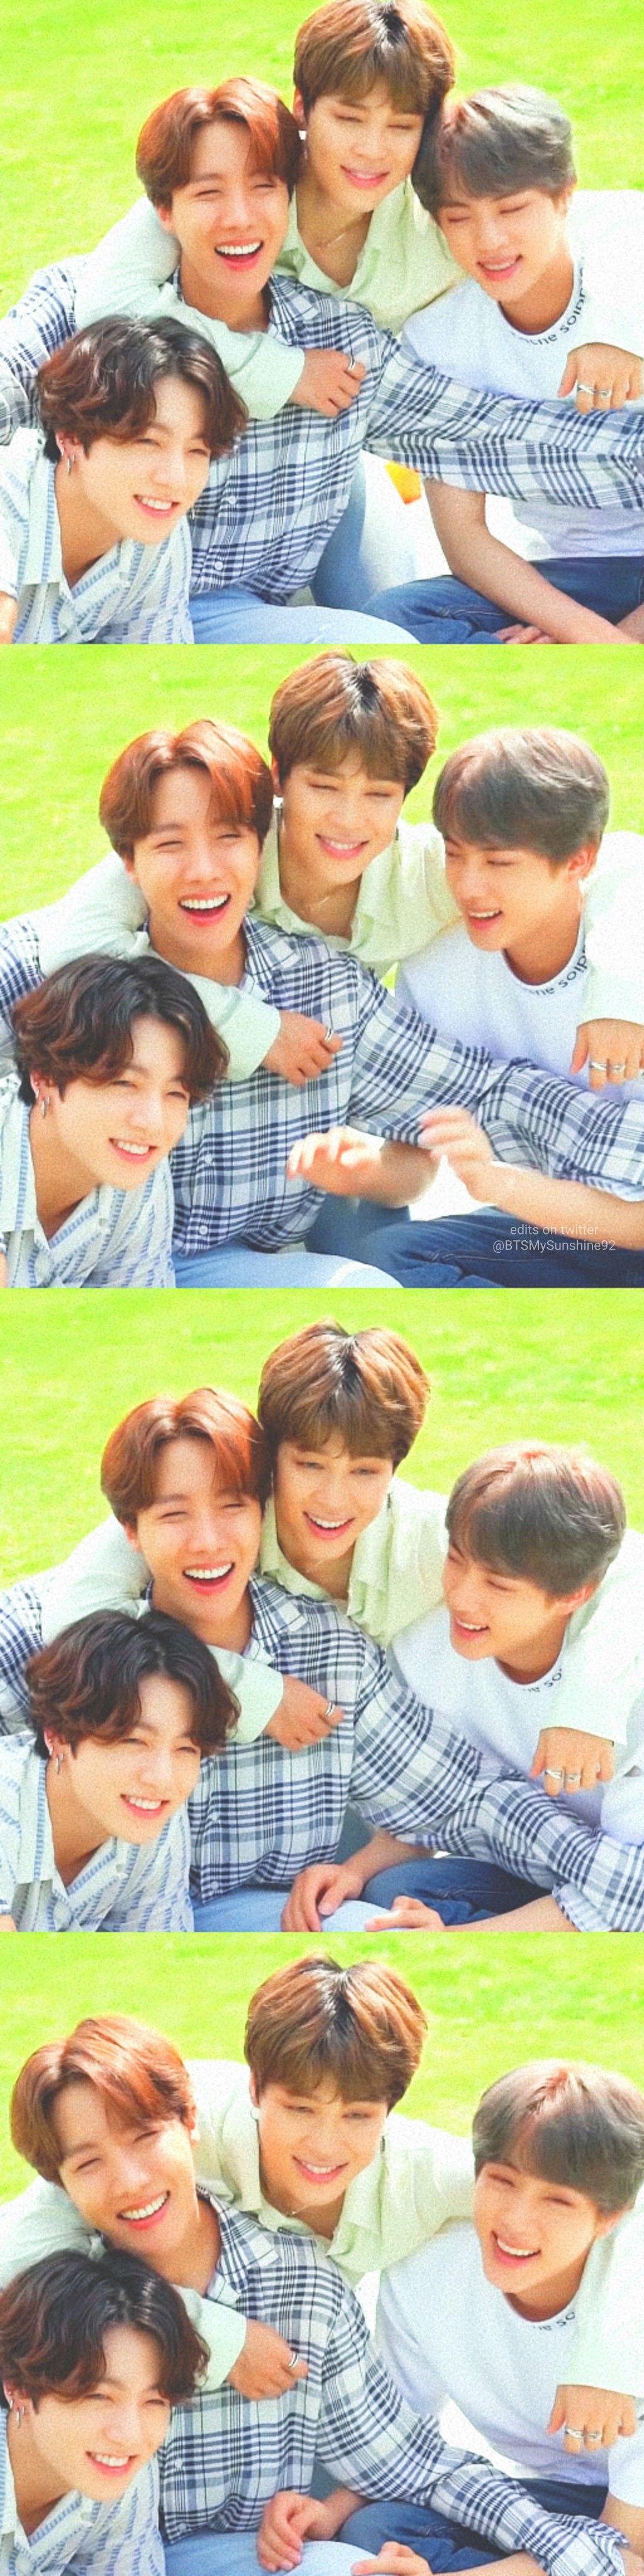 [PREVIEW] 'BTS 2019 SUMMER PACKAGE in KOREA' PREVIEW SPOT #2 #btssummerpackage2019